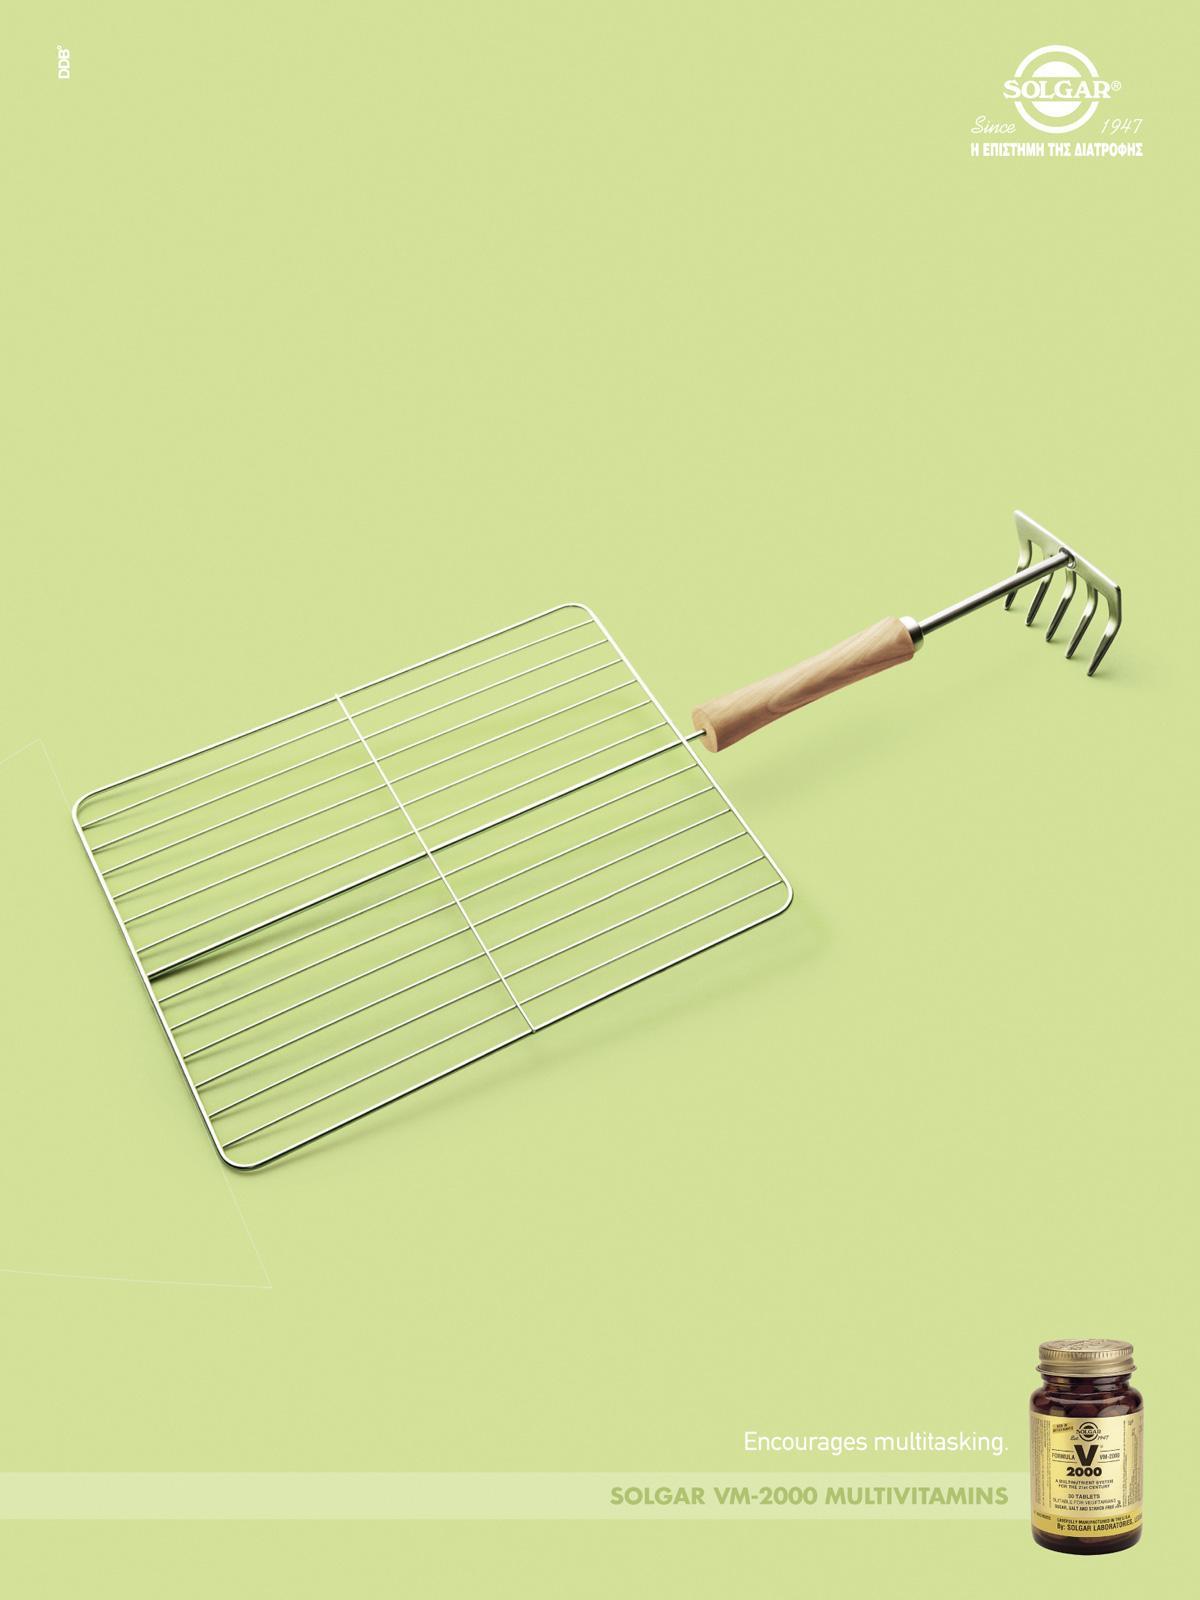 Solgar Print Ad -  Encourages multitasking, 1